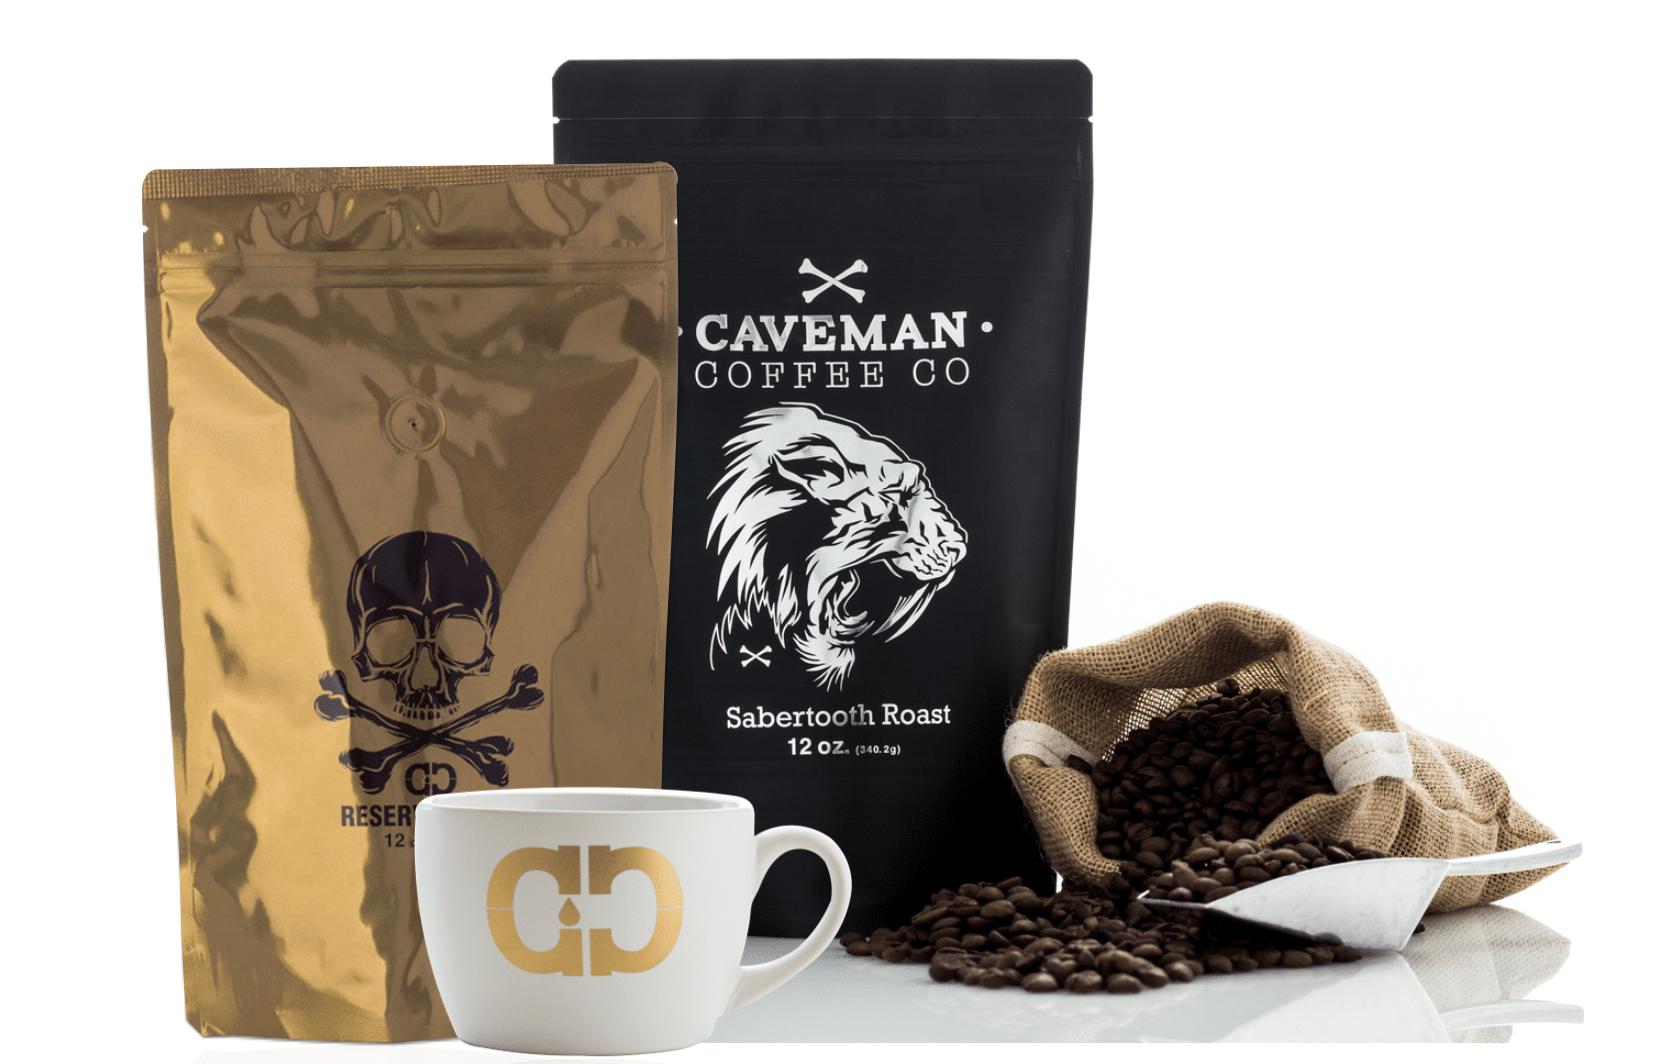 Caveman Coffee - Certified Paleo, KETO Certified, PaleoVegan - Paleo Foundation